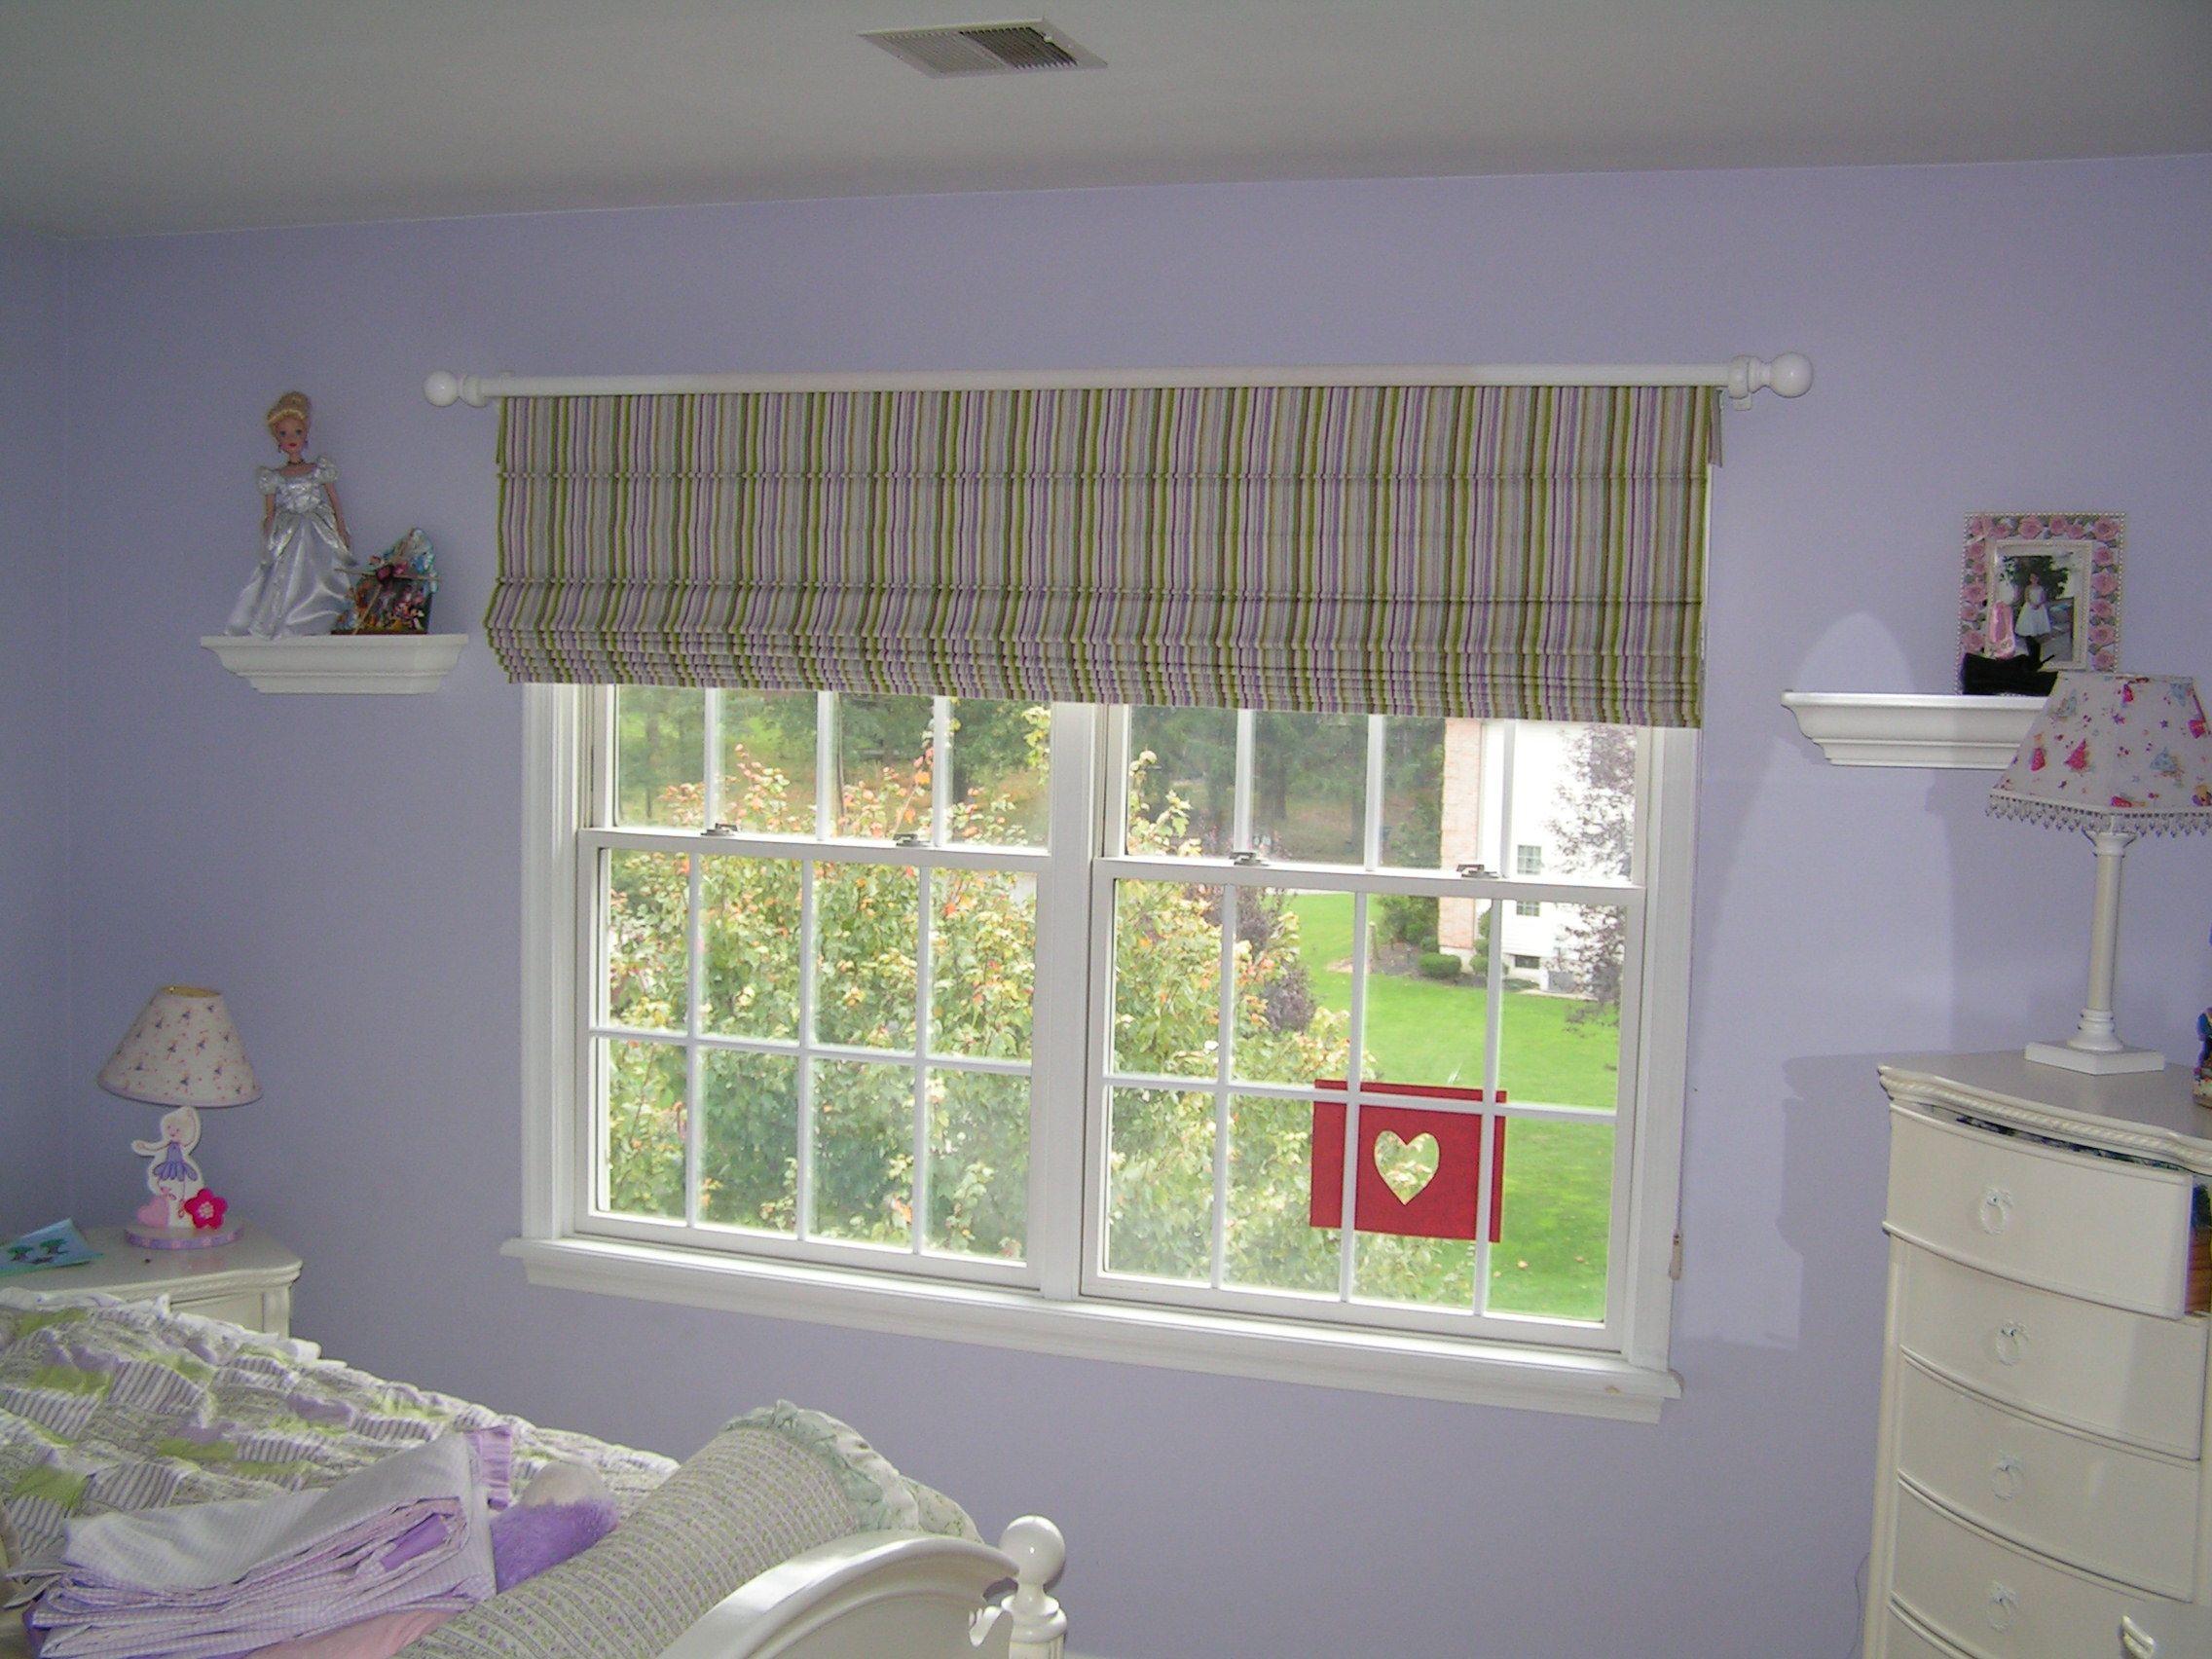 Batten Back Style Roman Shade Roman Shades Window Styles Shades